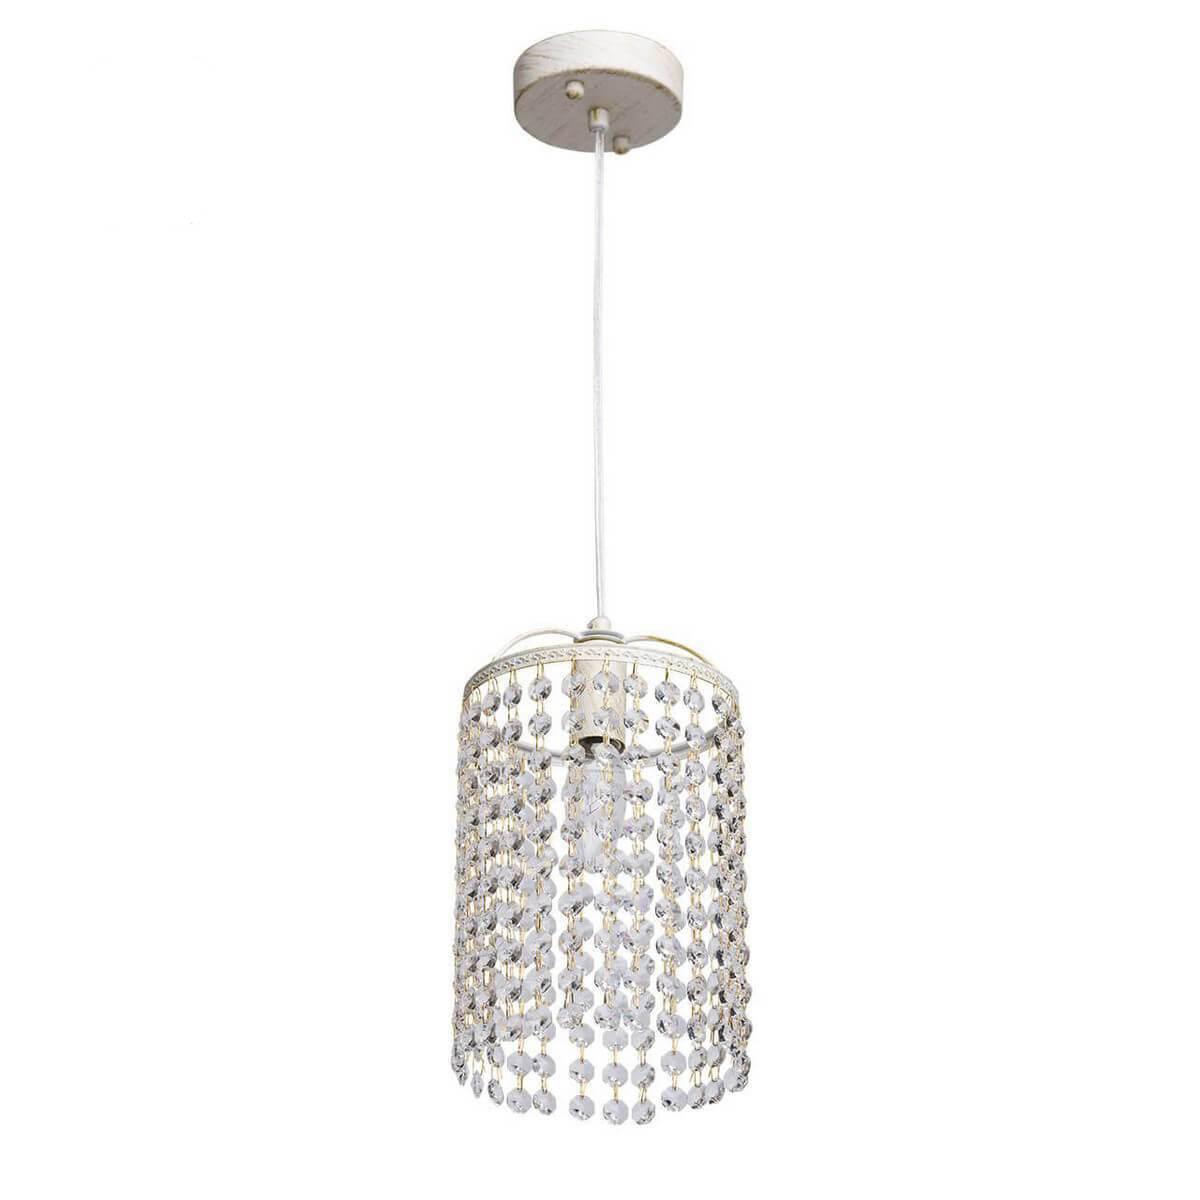 Светильник MW-Light 464016801 Бриз светильник подвесной mw light бриз 464012201